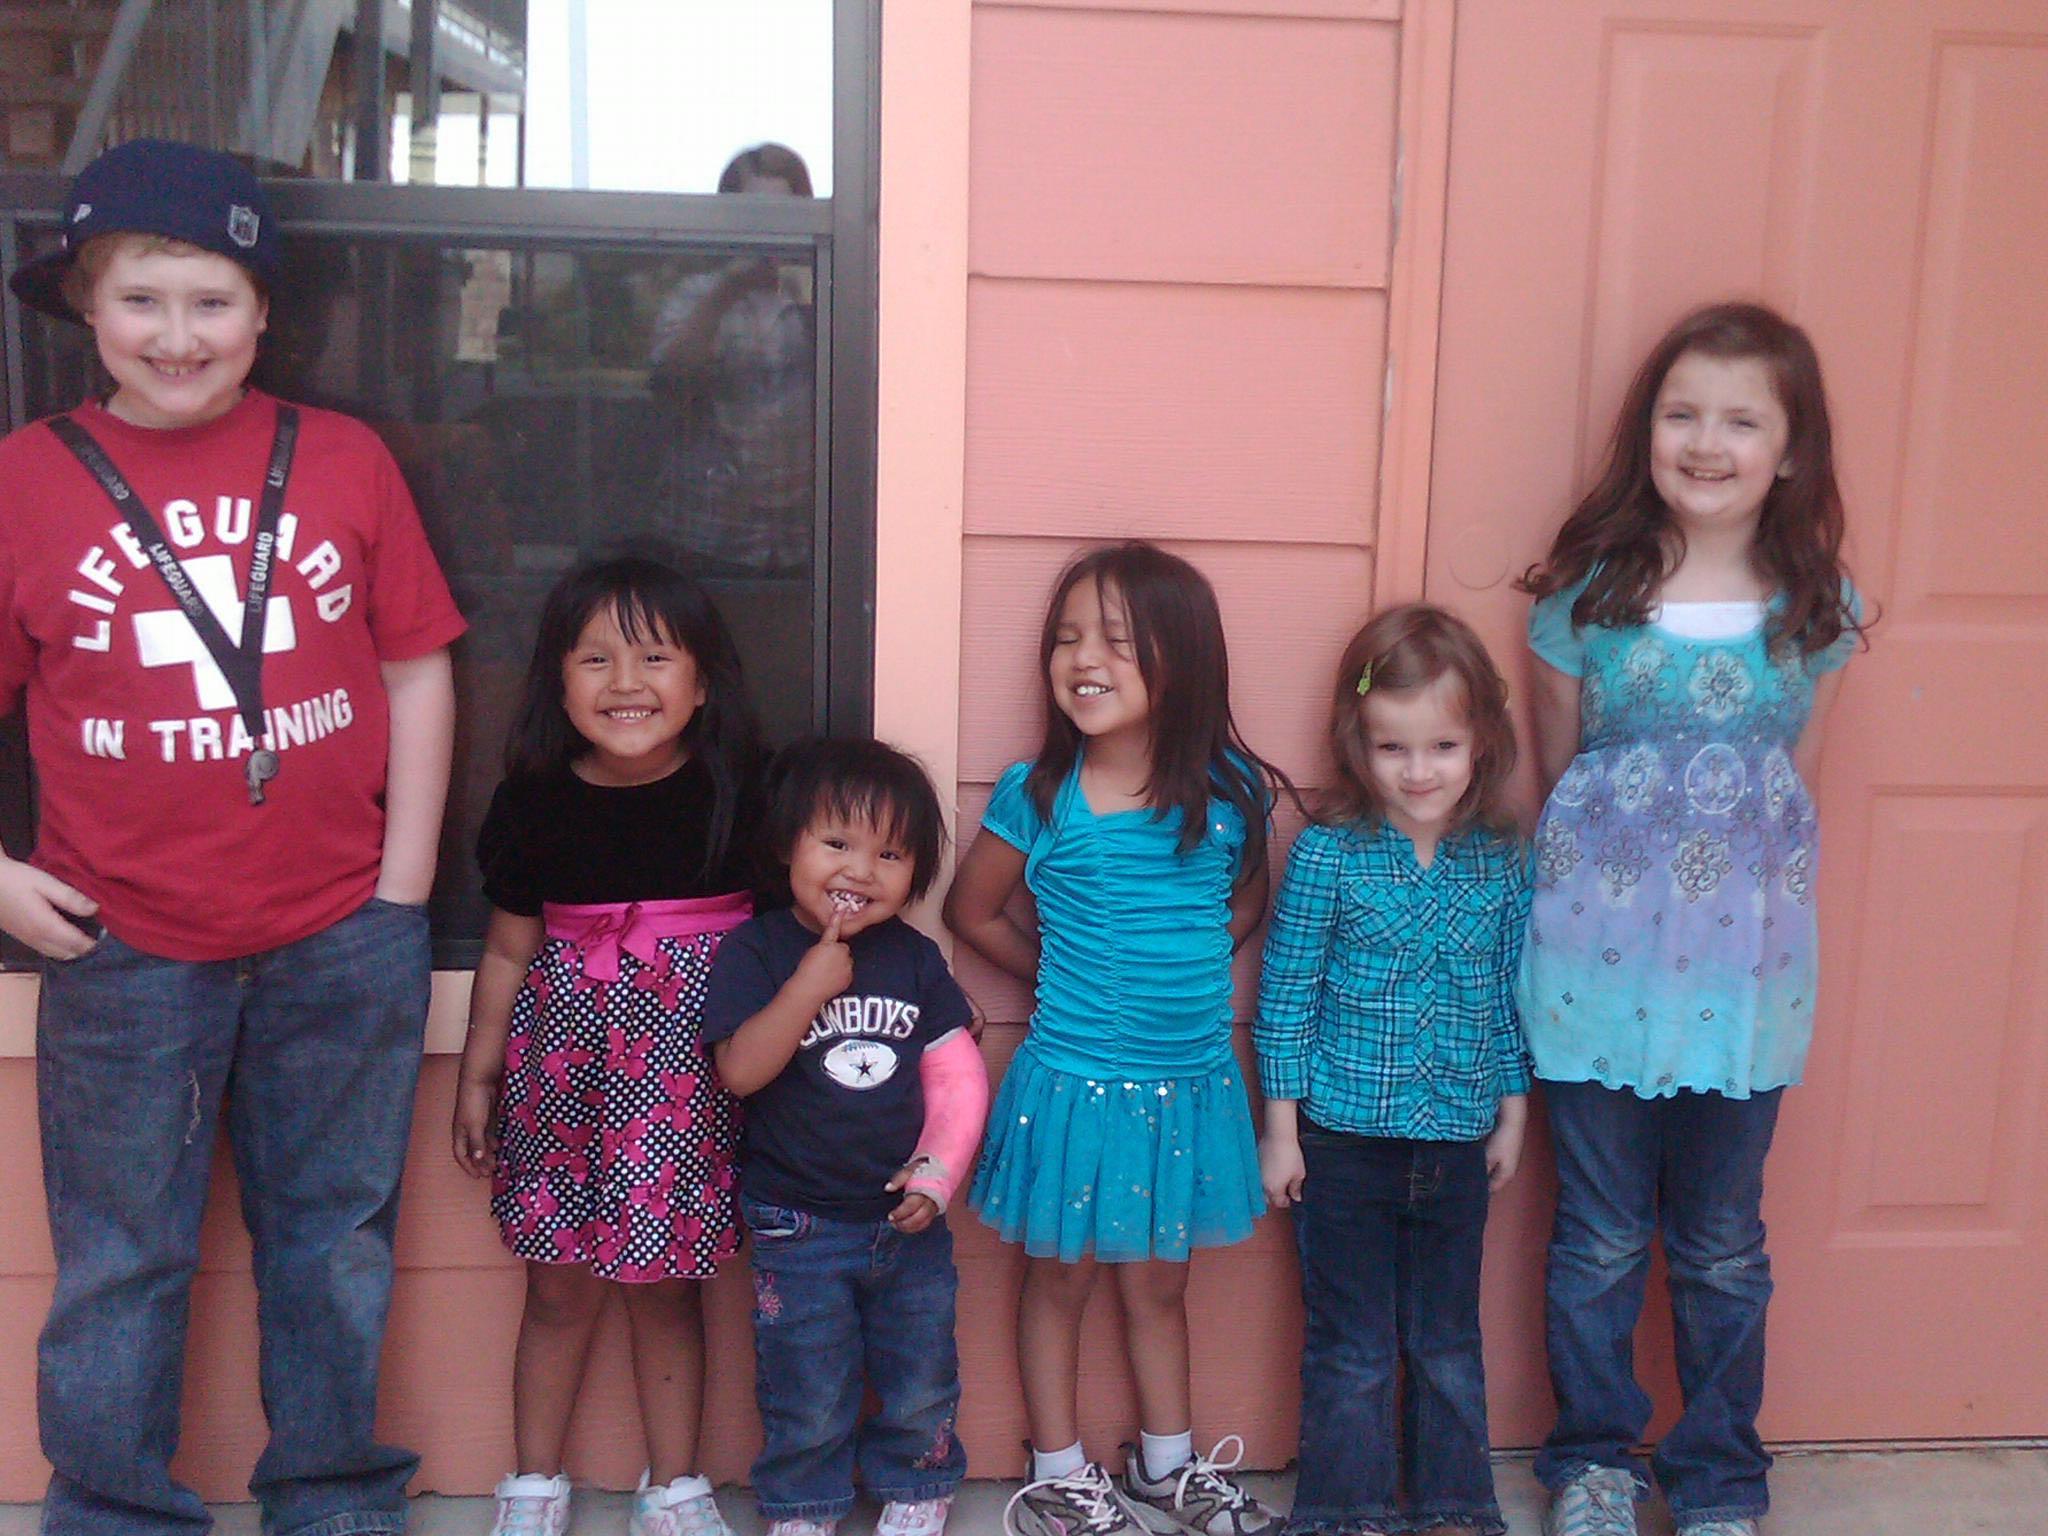 children of new mexico.jpg